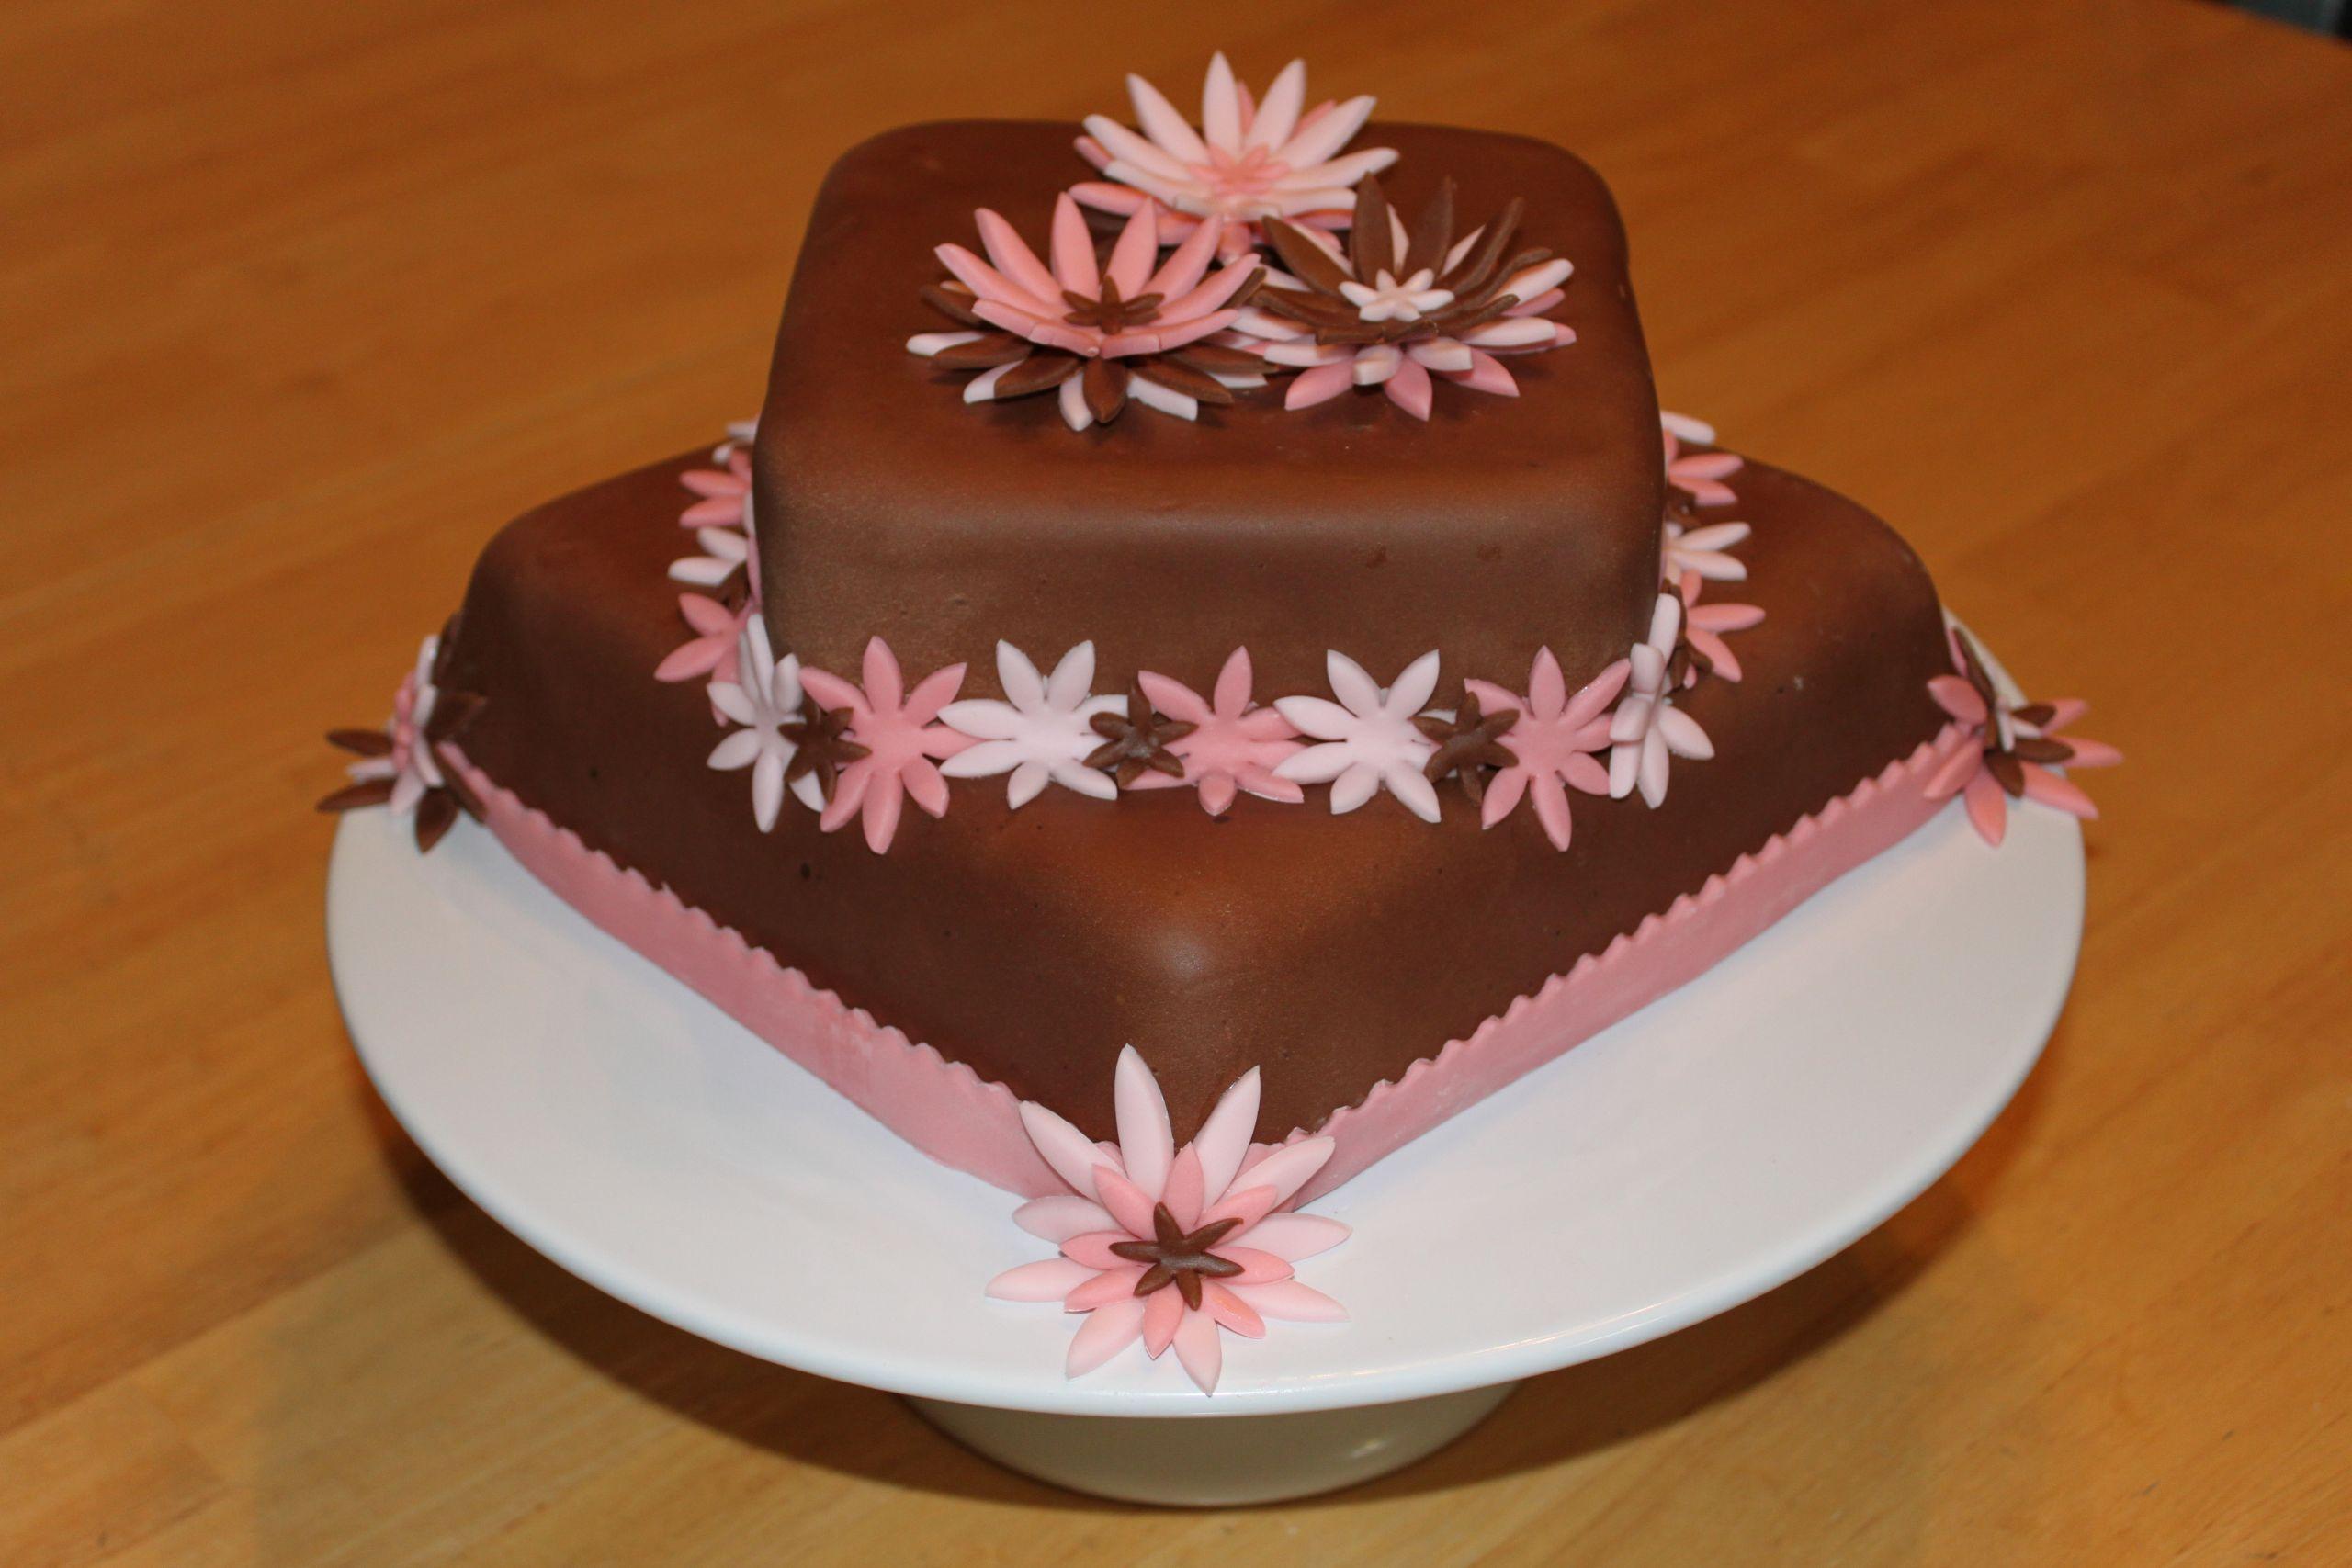 Fondant Birthday Cakes  Chocolate Fondant Birthday Cake with Flowers The Original